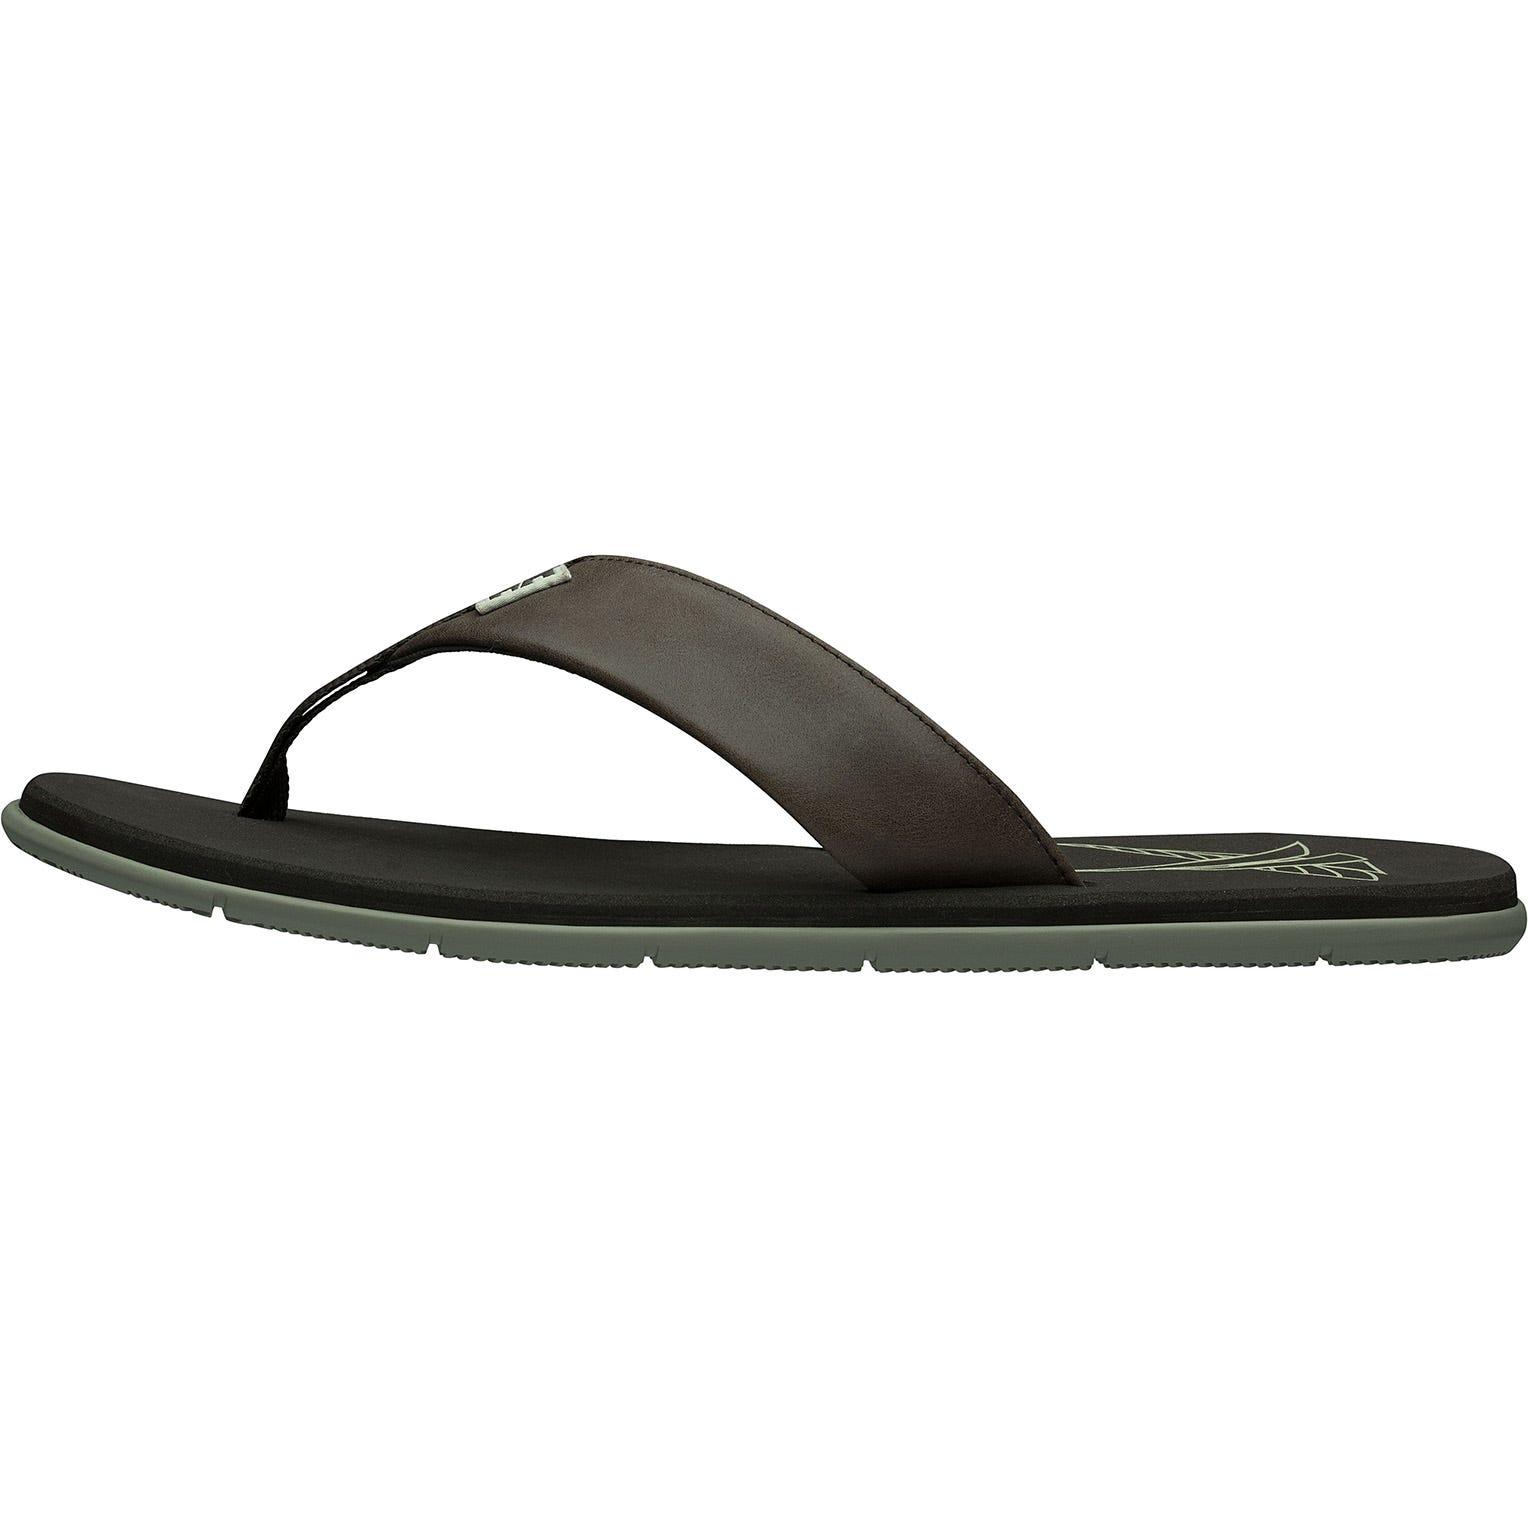 Helly Hansen Seasand Leather Sandal Mens Brown 41/8